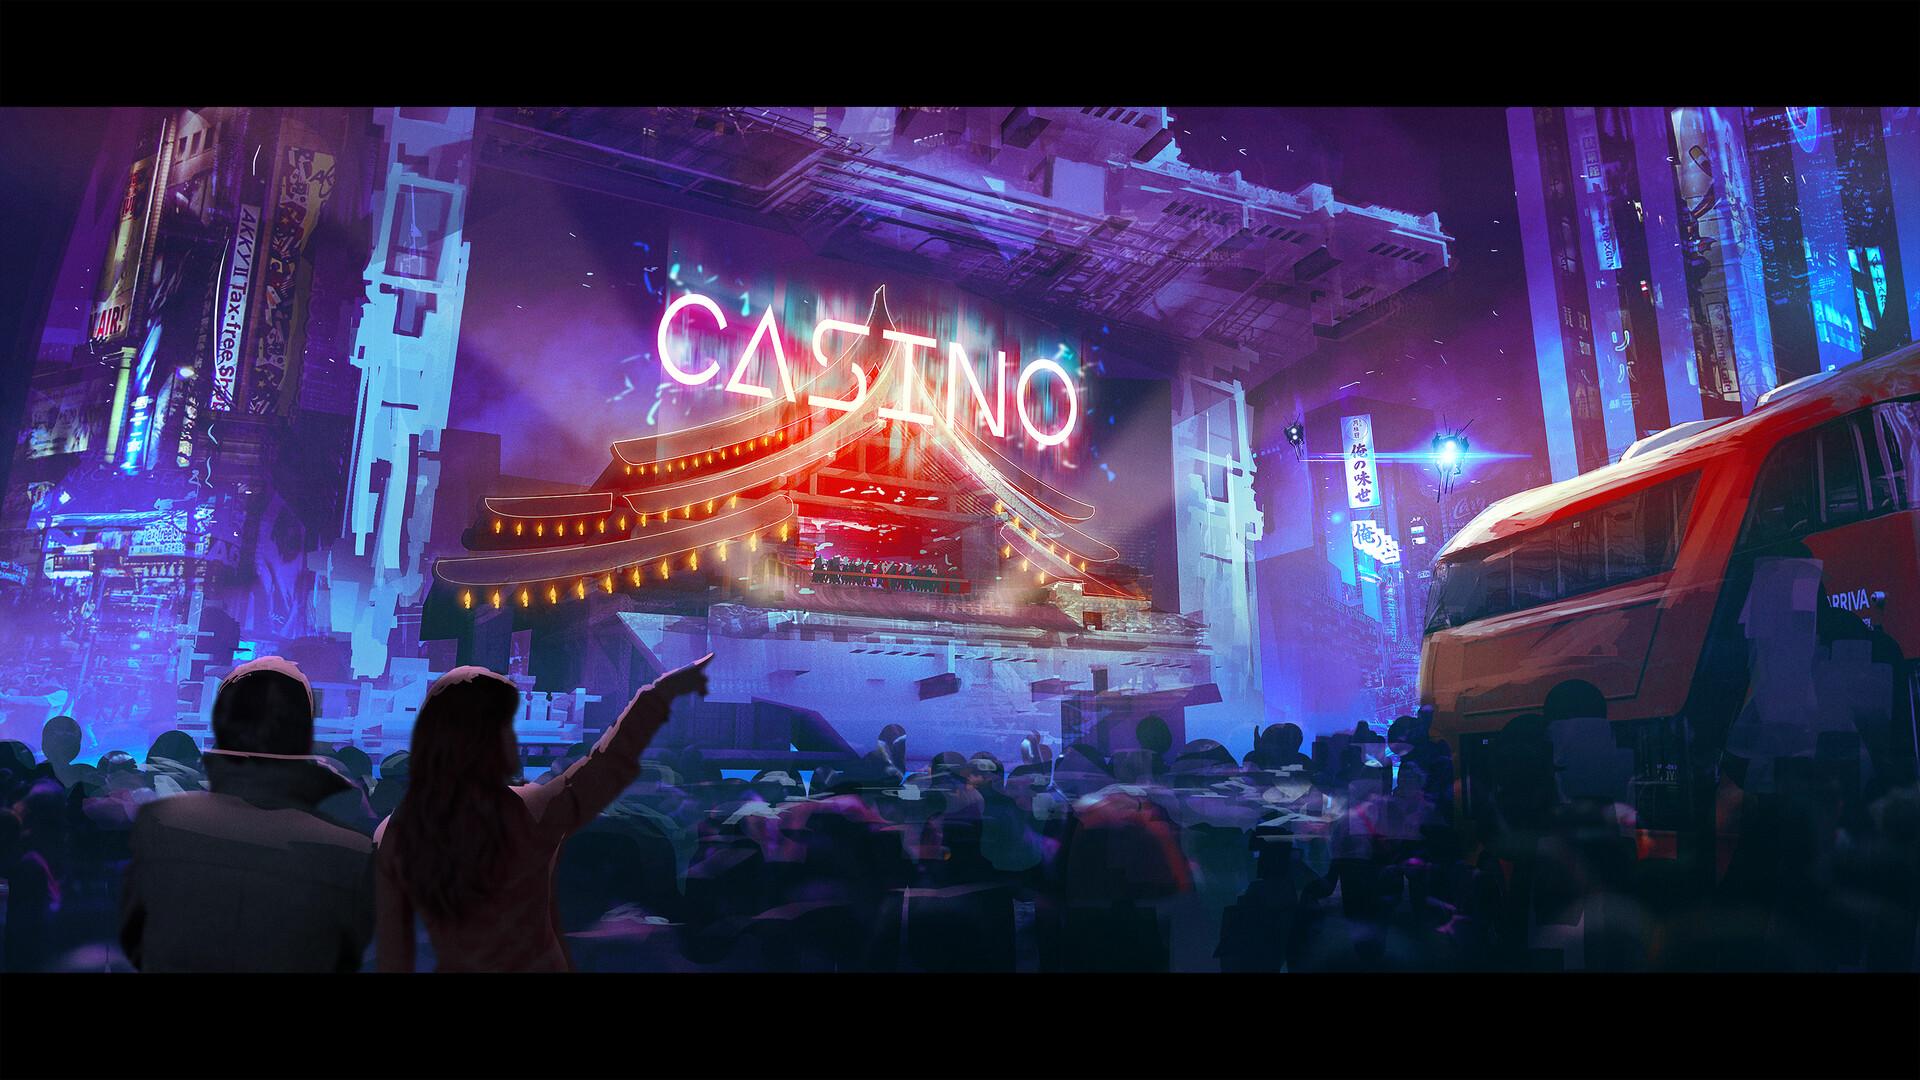 https://db4sgowjqfwig.cloudfront.net/campaigns/194159/assets/1117084/simon-krieg-scifi-casino.jpg?1601418037